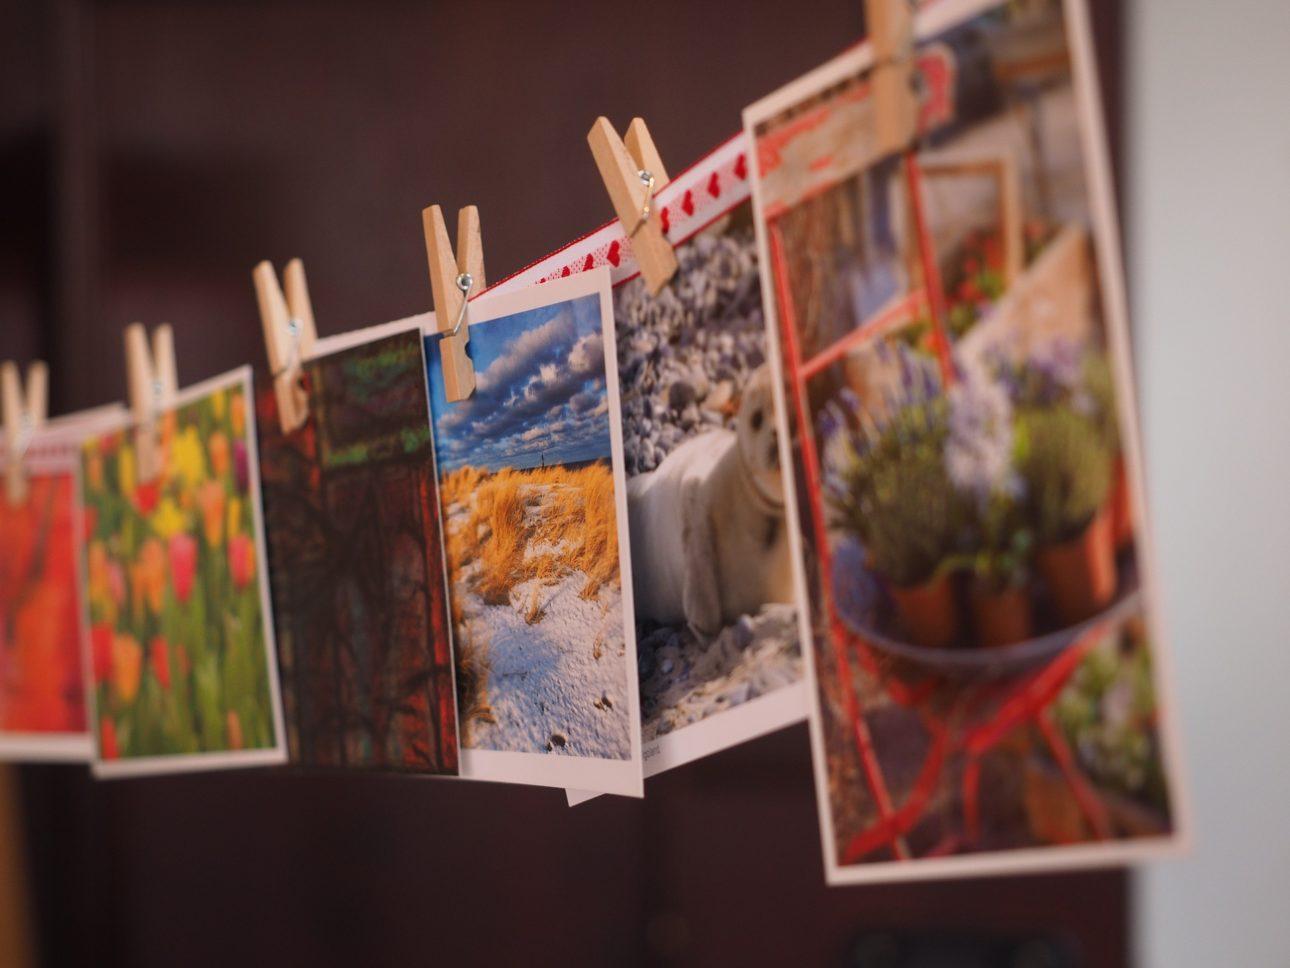 postcards-1174179_1920